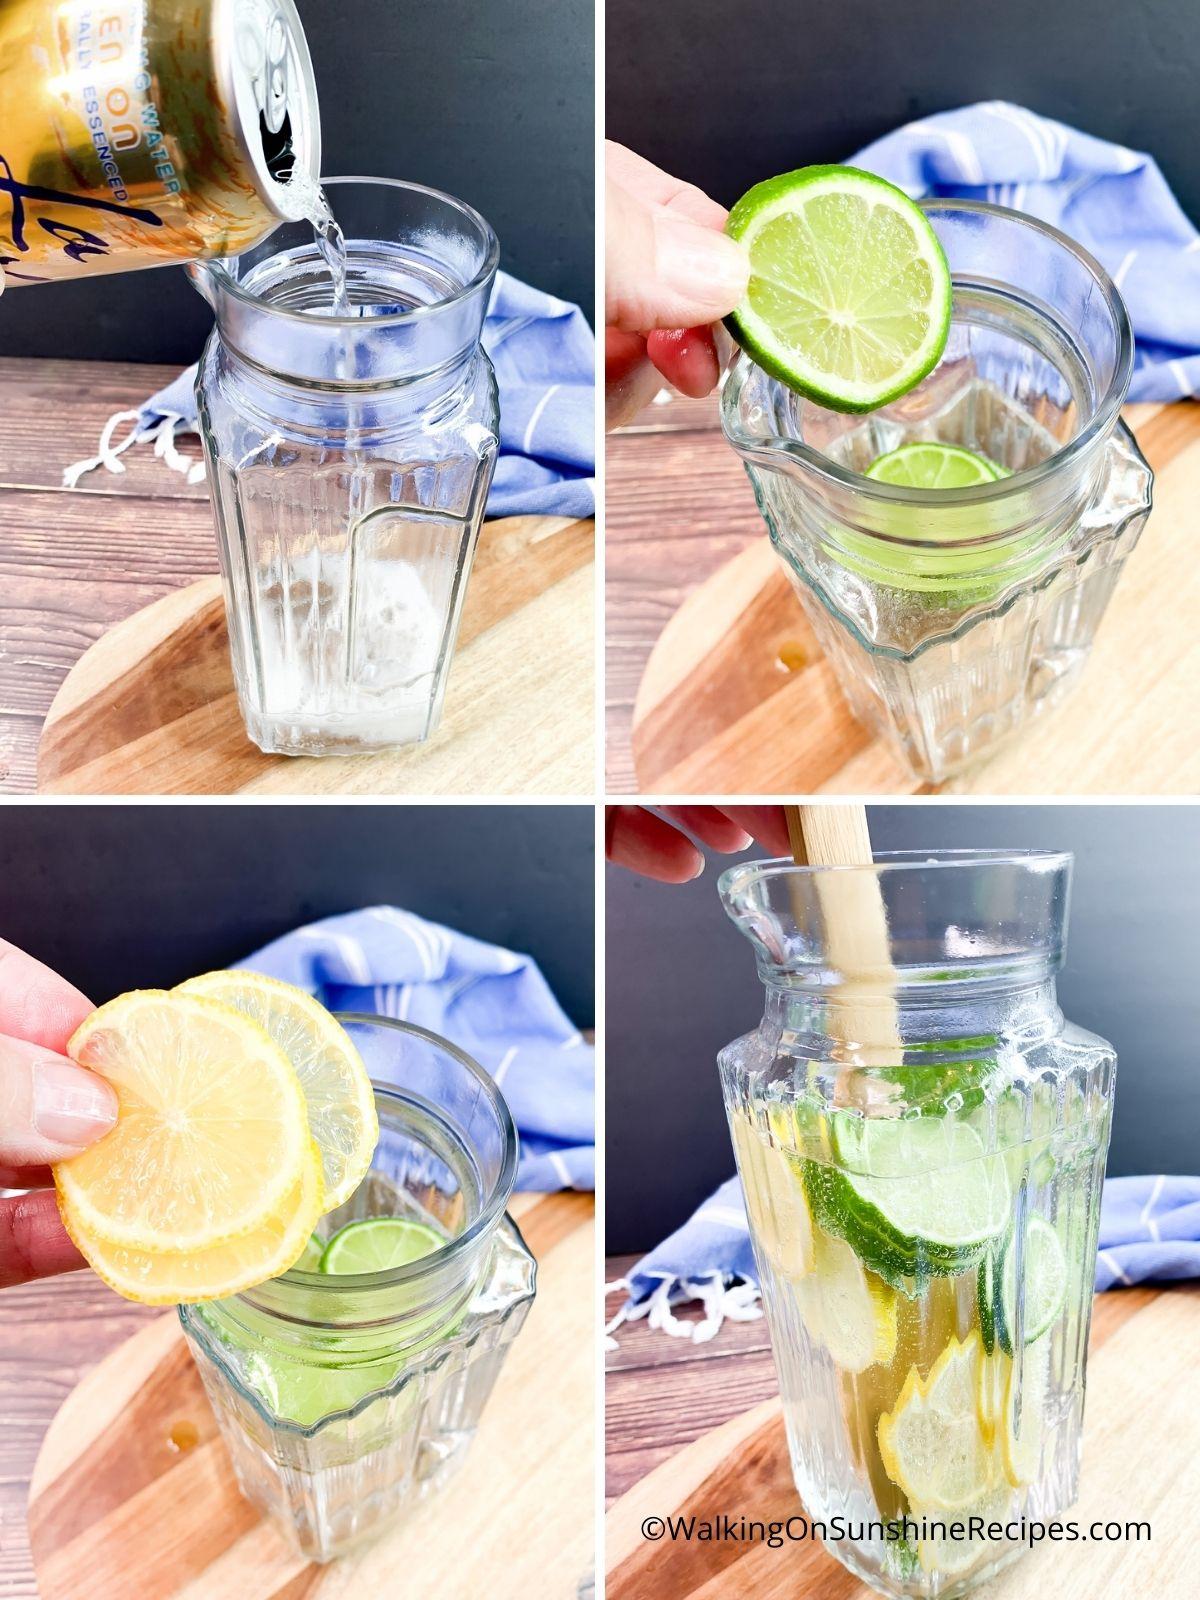 Add limes, lemon to pitcher.